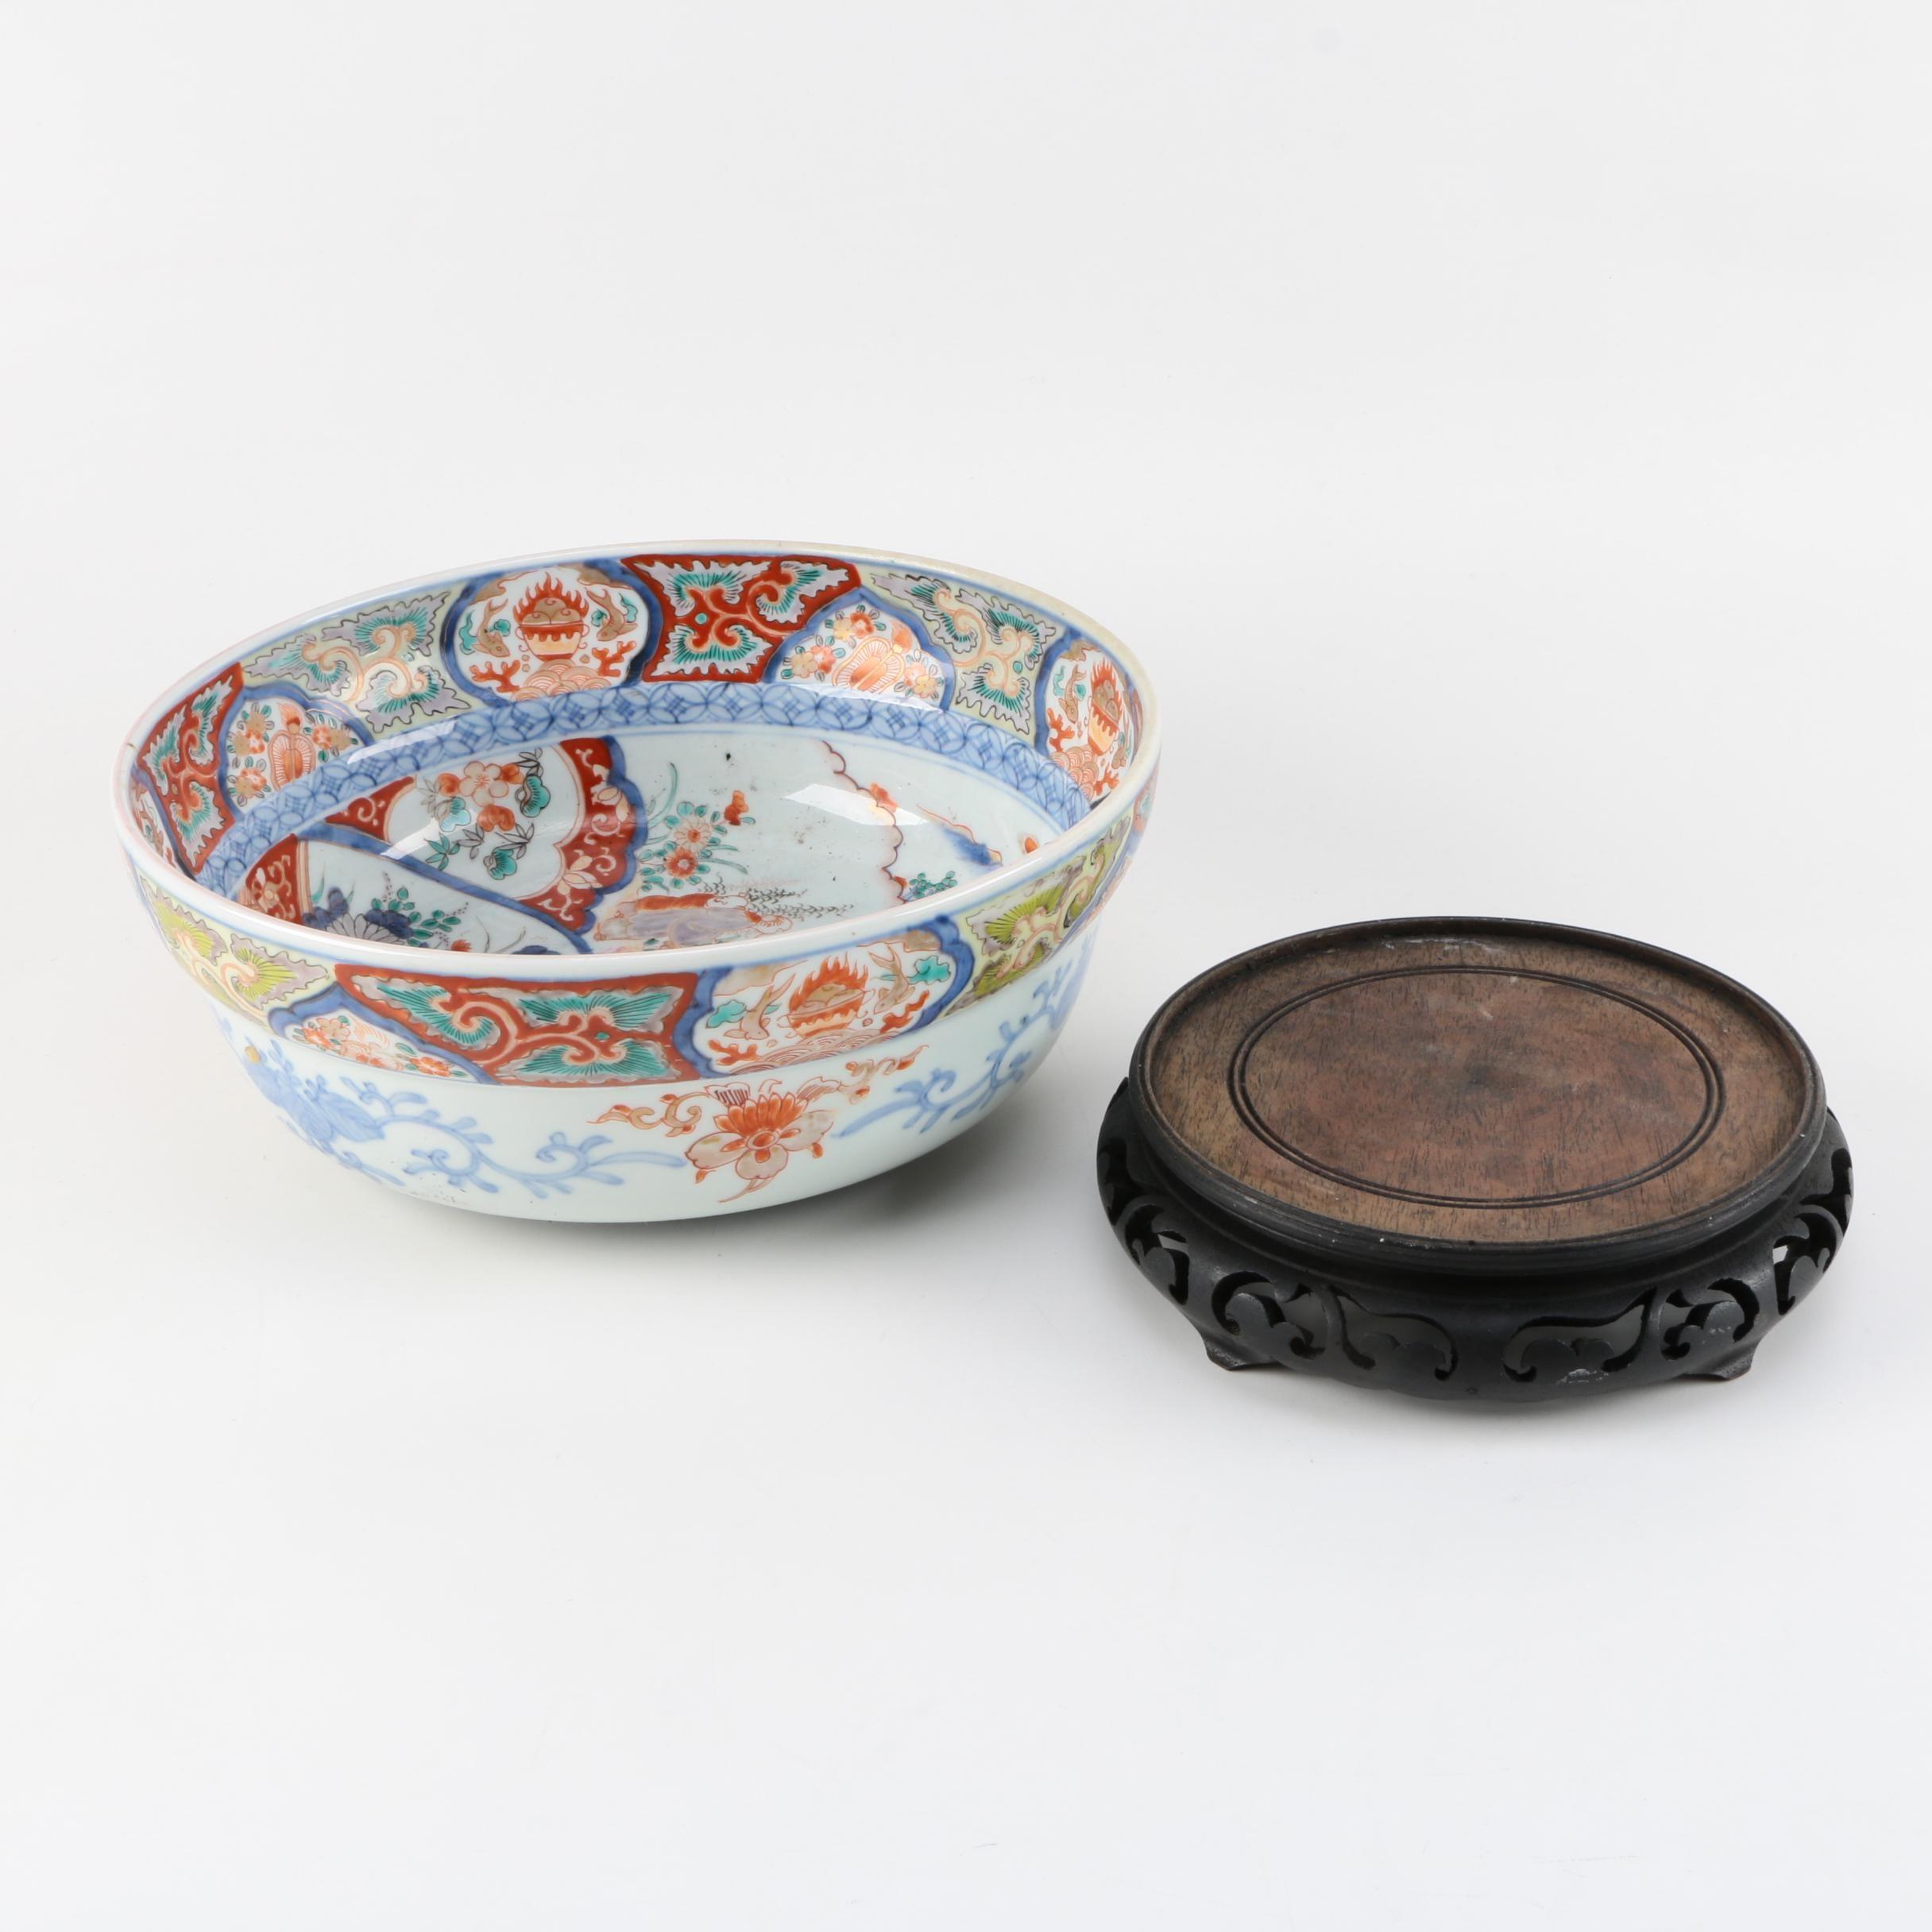 East Asian Imari Palette Ceramic Bowl and Wooden Base